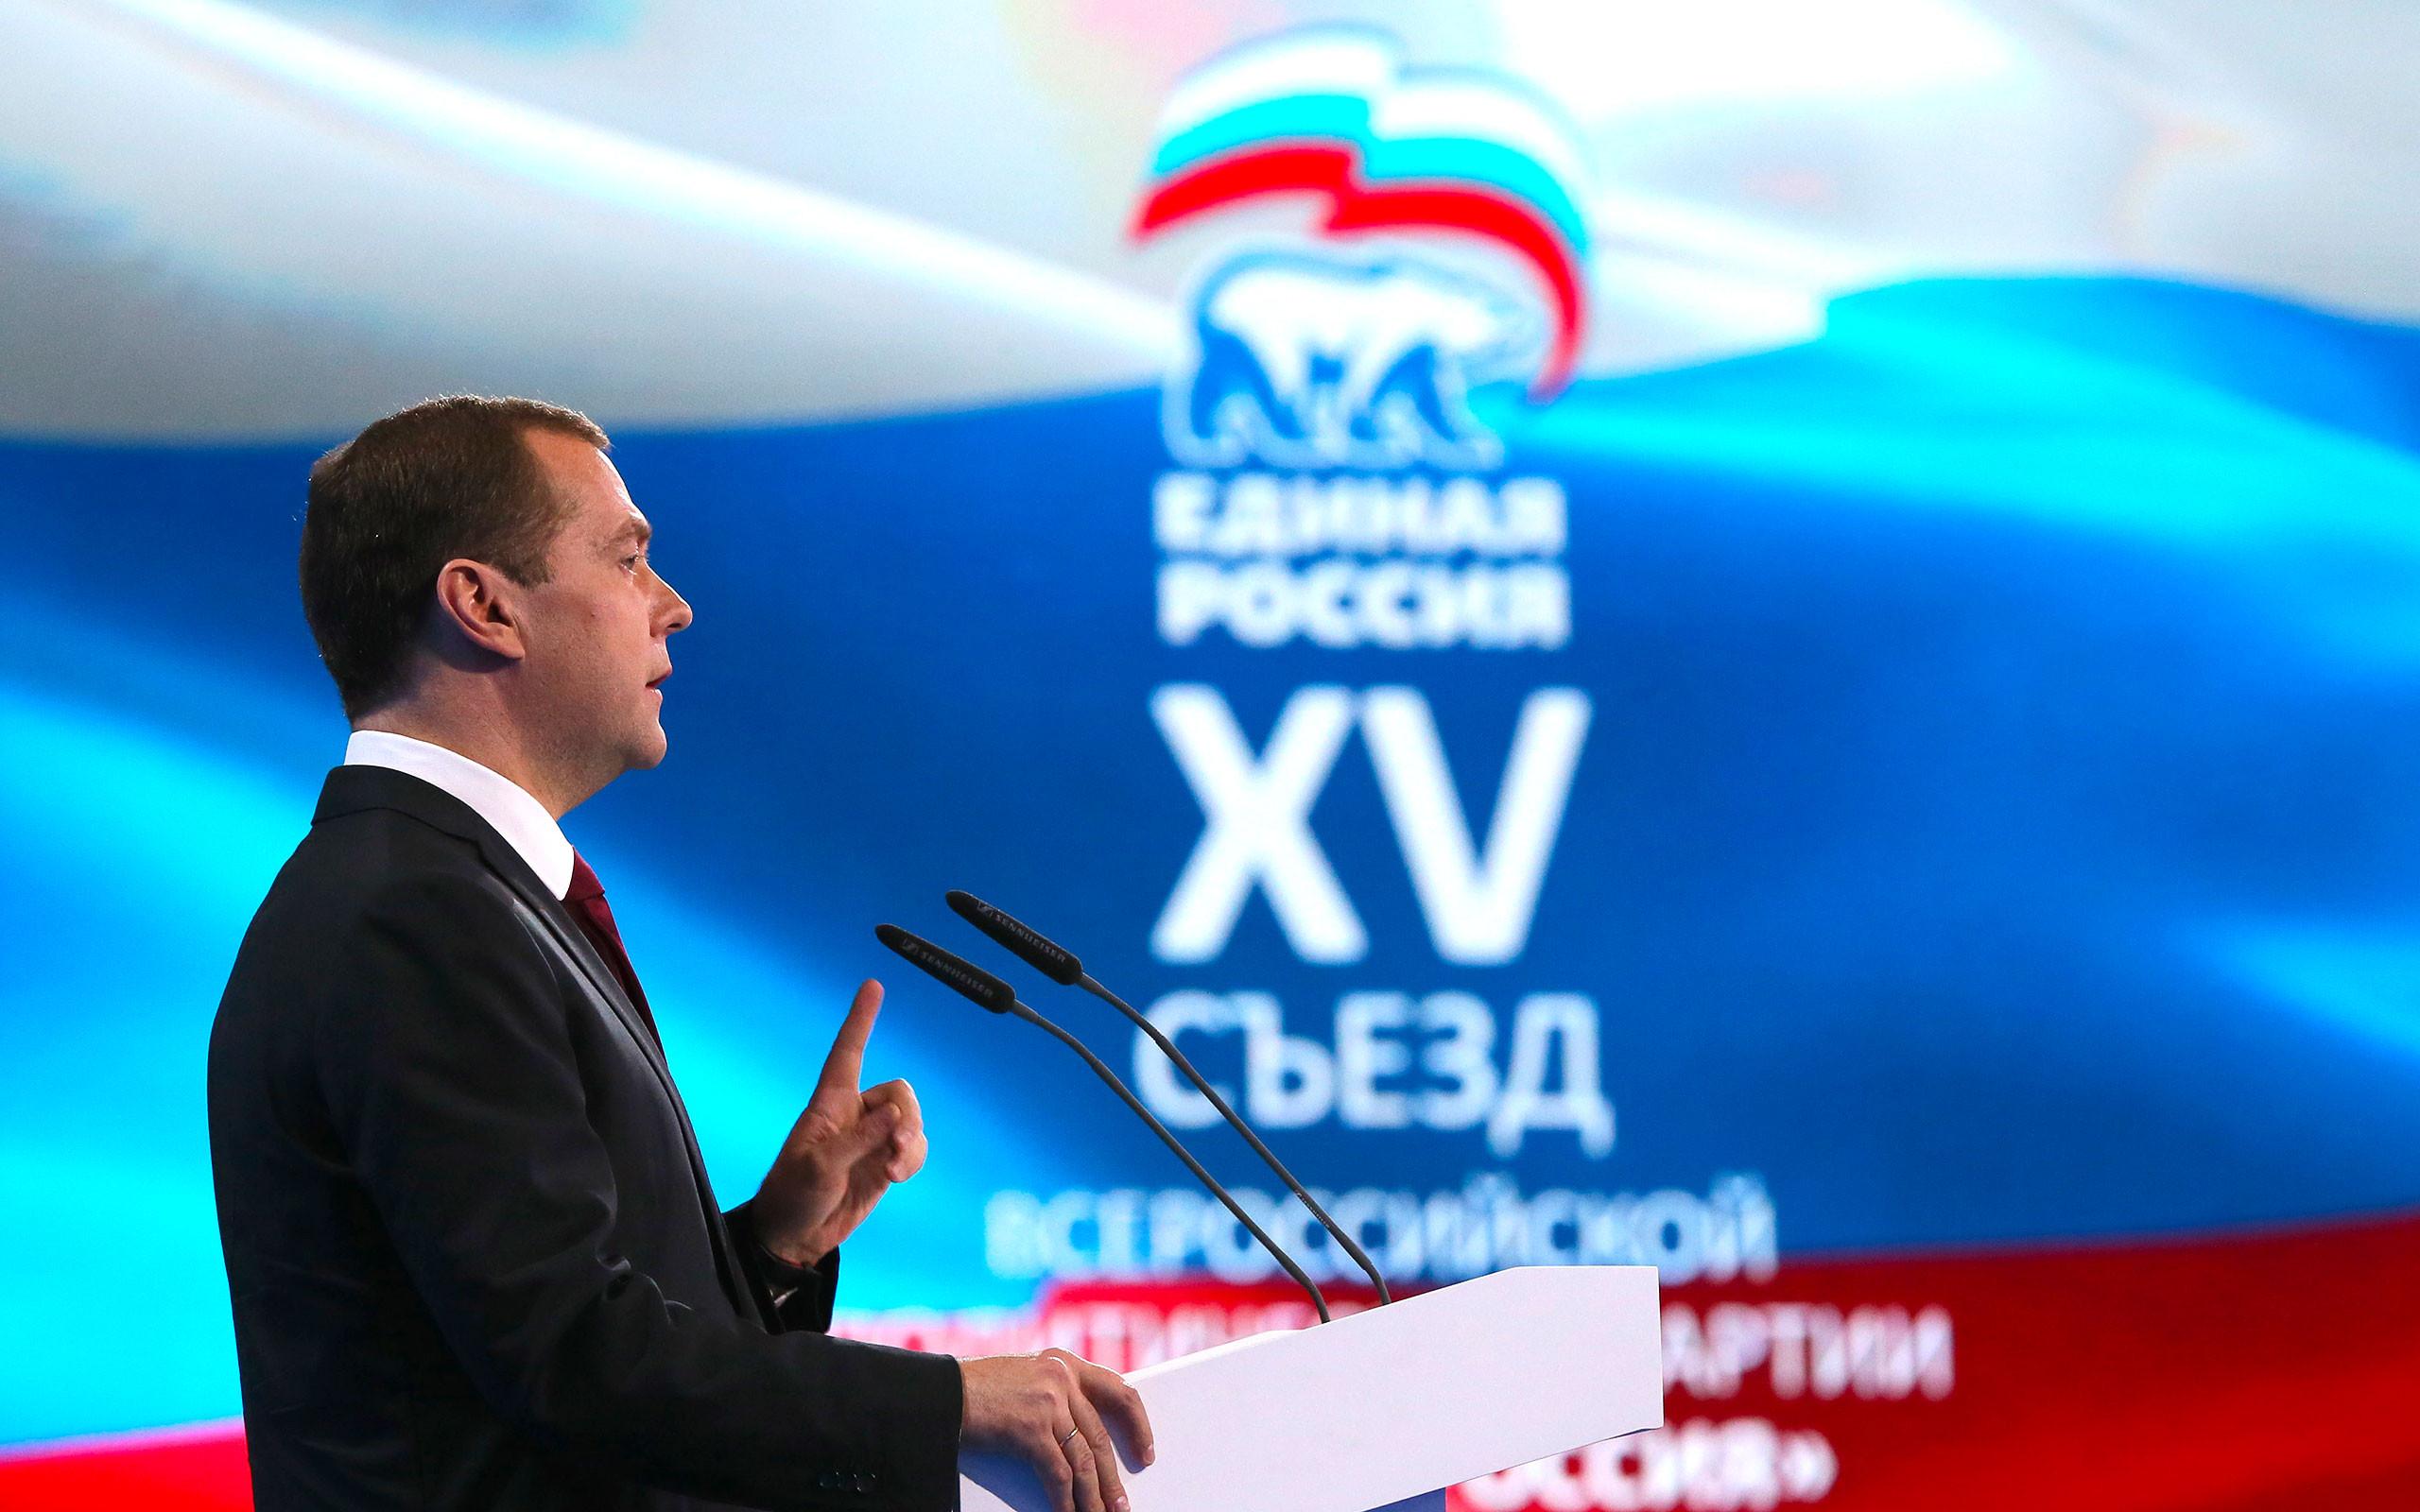 <p>Фото: &copy; РИА Новости/Екатерина Штукина</p>